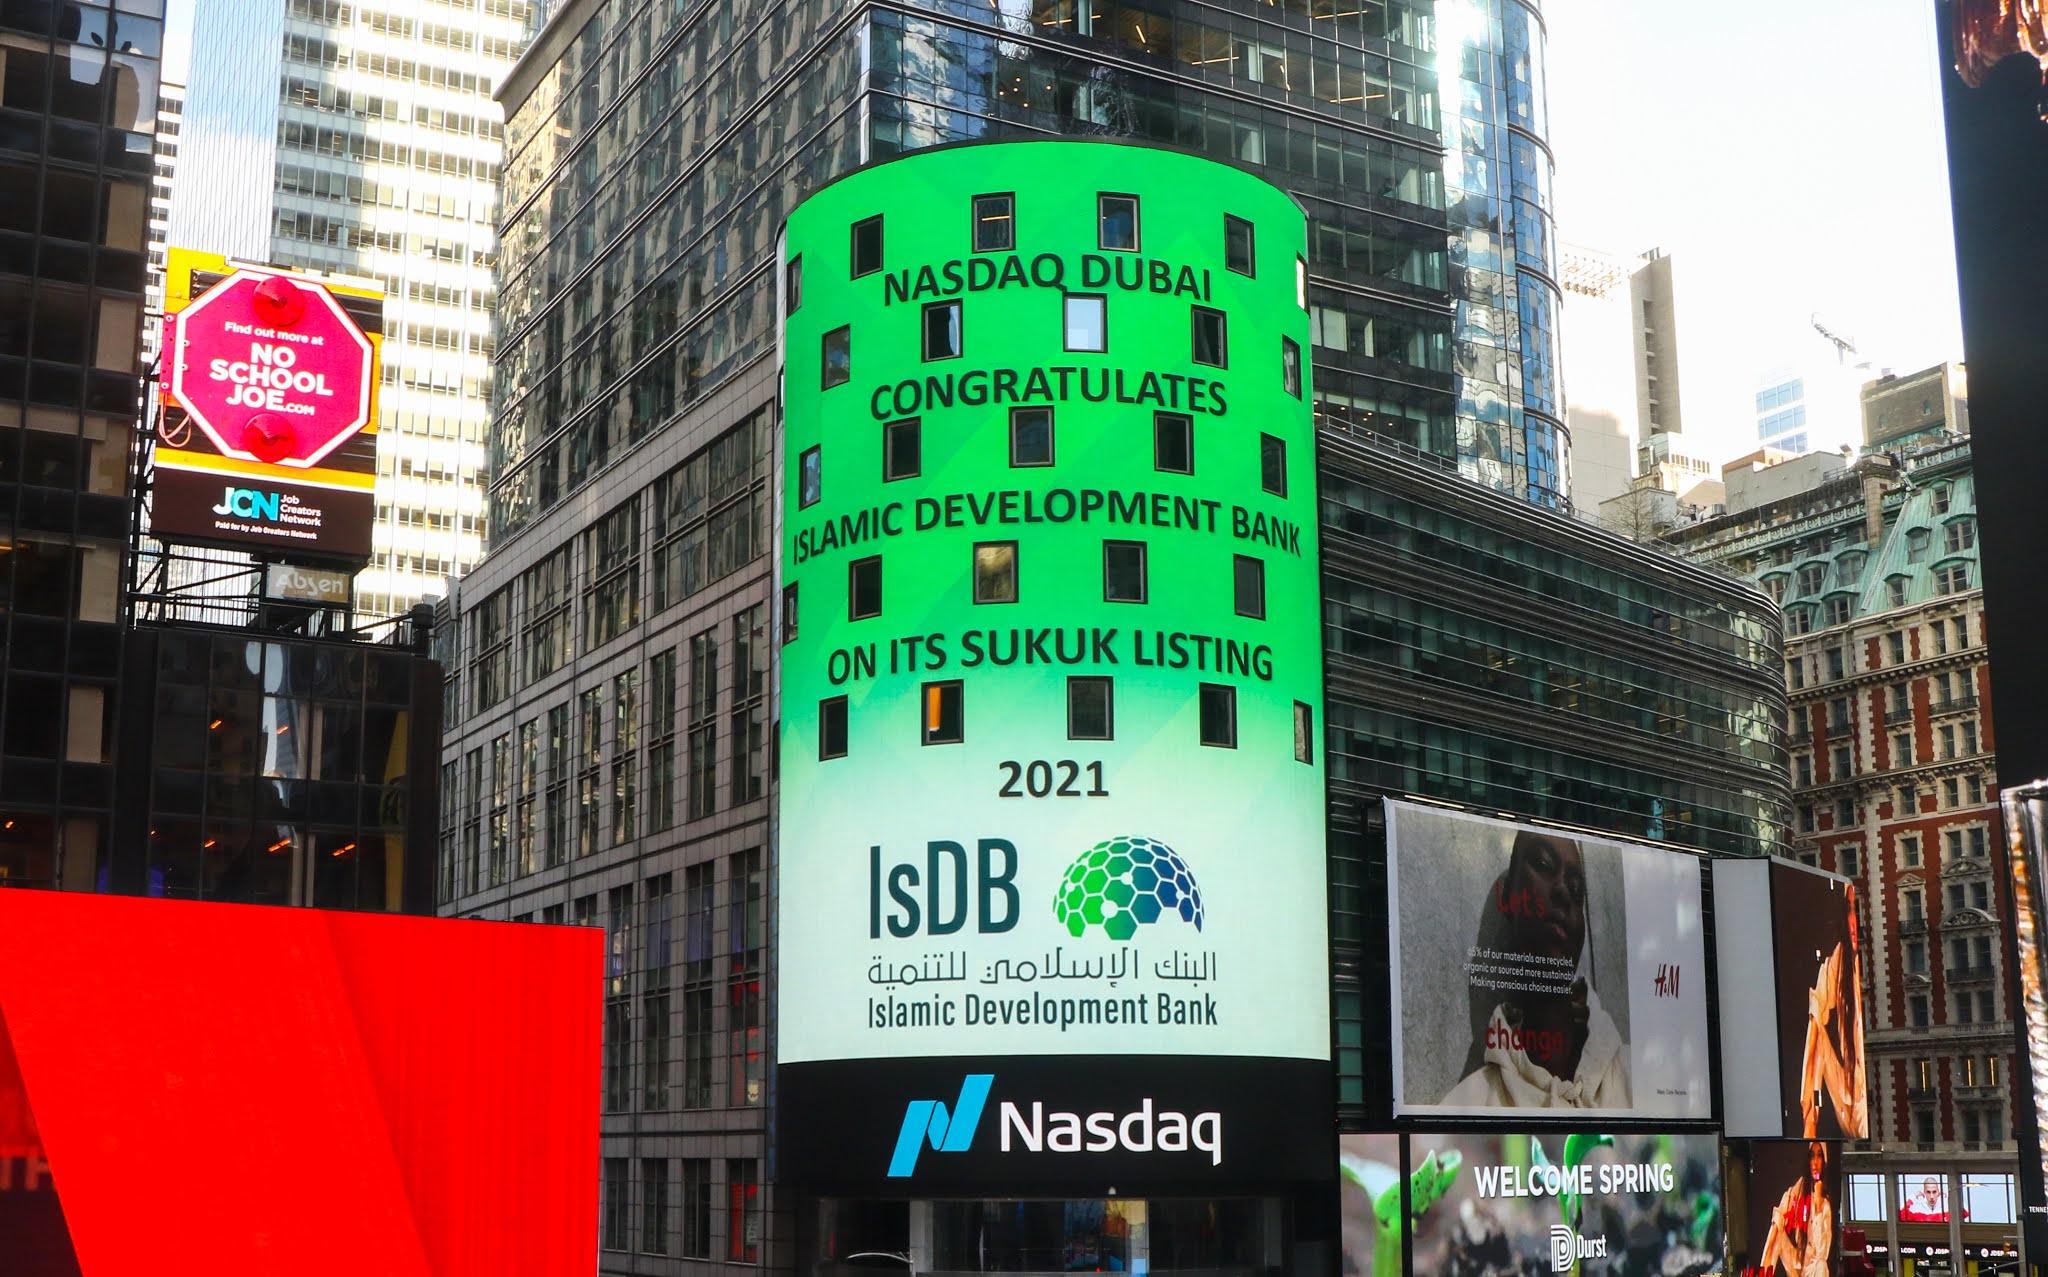 $2.5 billion Sustainability Sukuk by Islamic Development Bank (IsDB) listed on Nasdaq Dubai